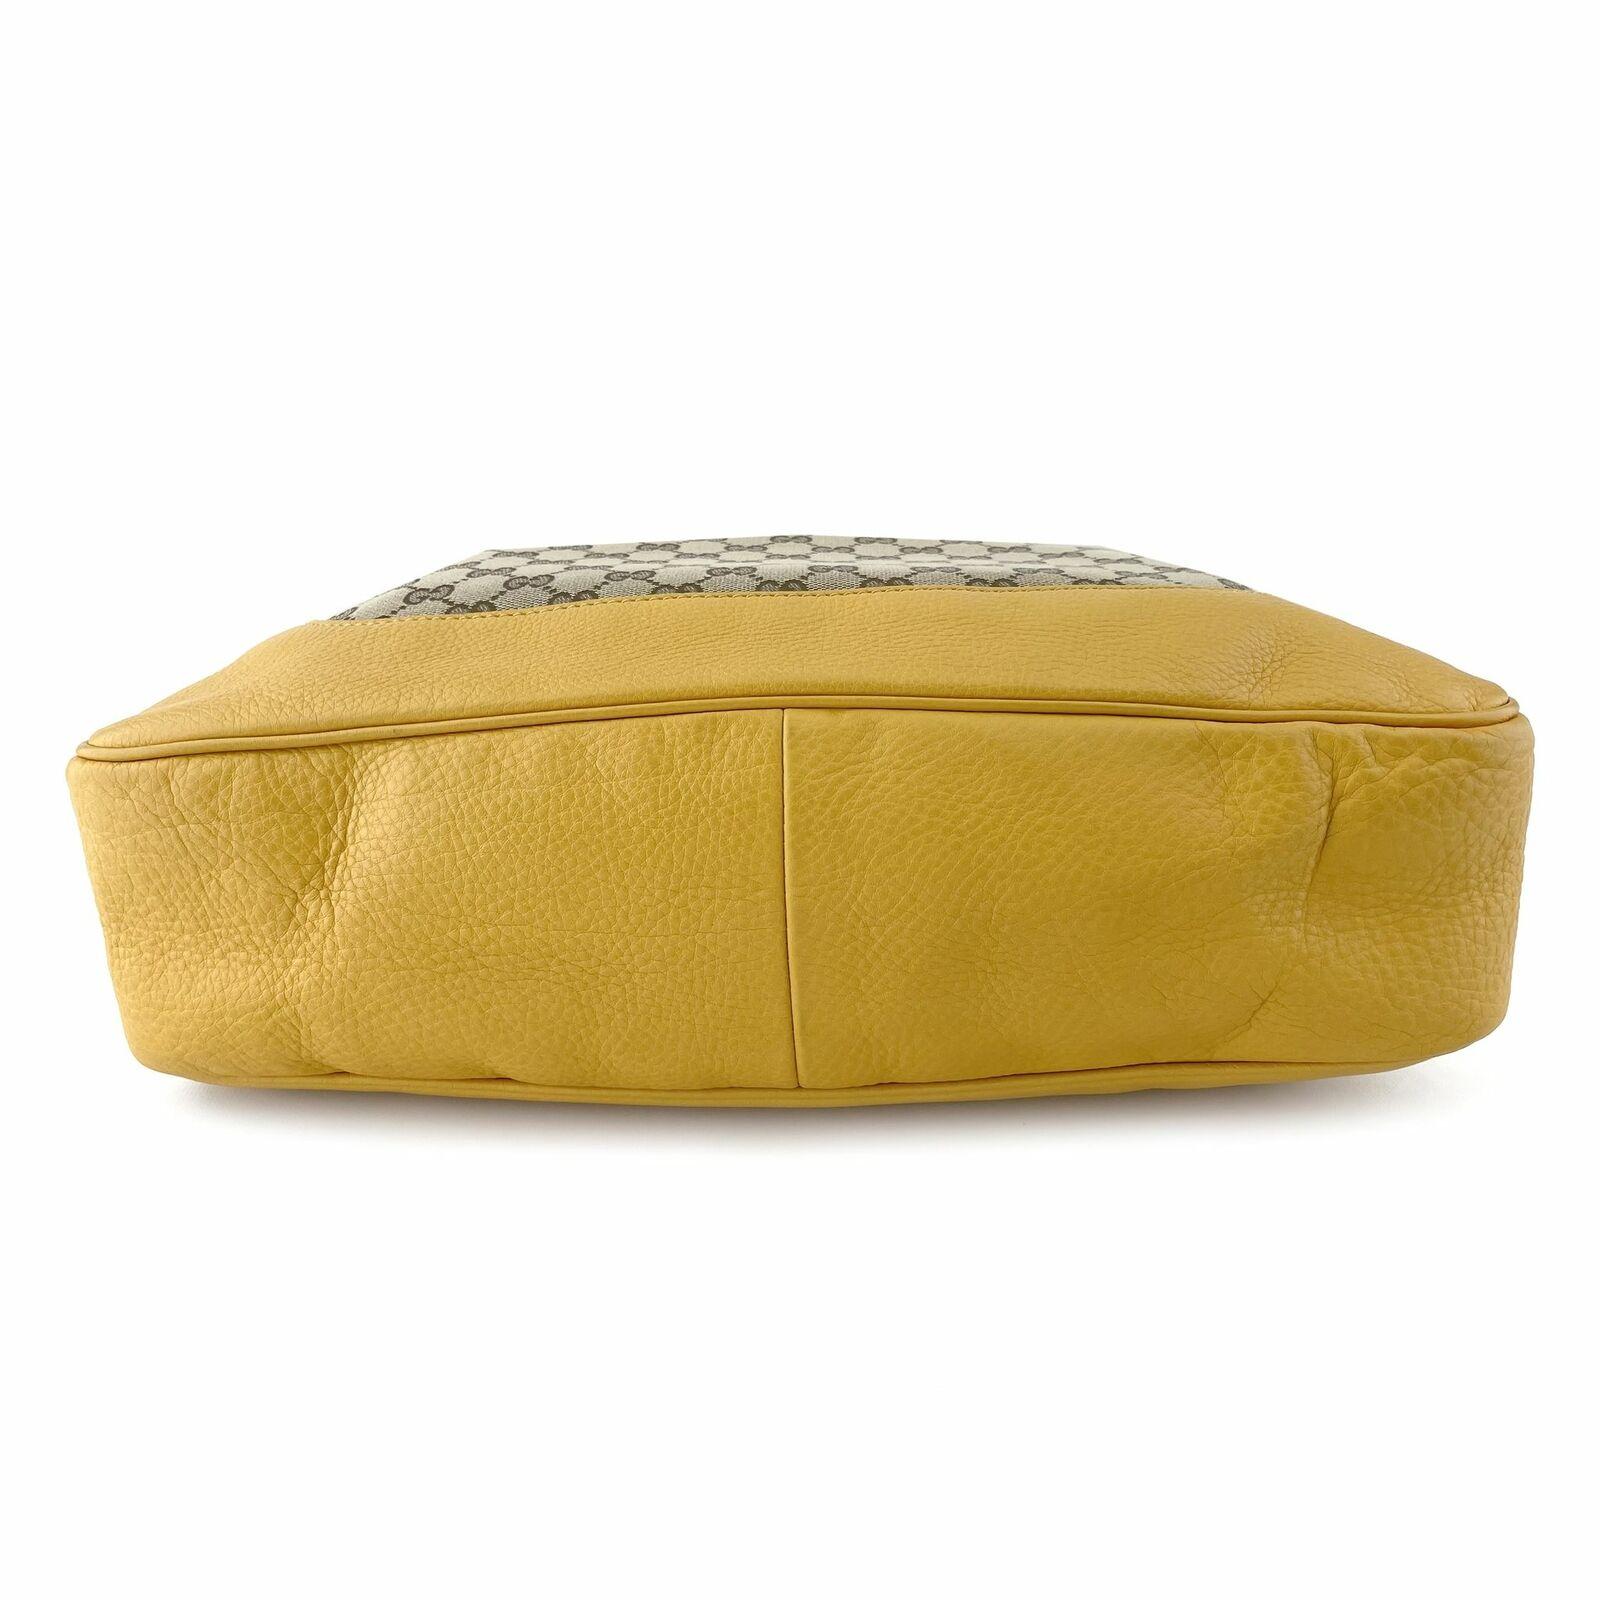 Gucci GG Canvas Diana Bamboo Shoulder Bag - Beige… - image 7